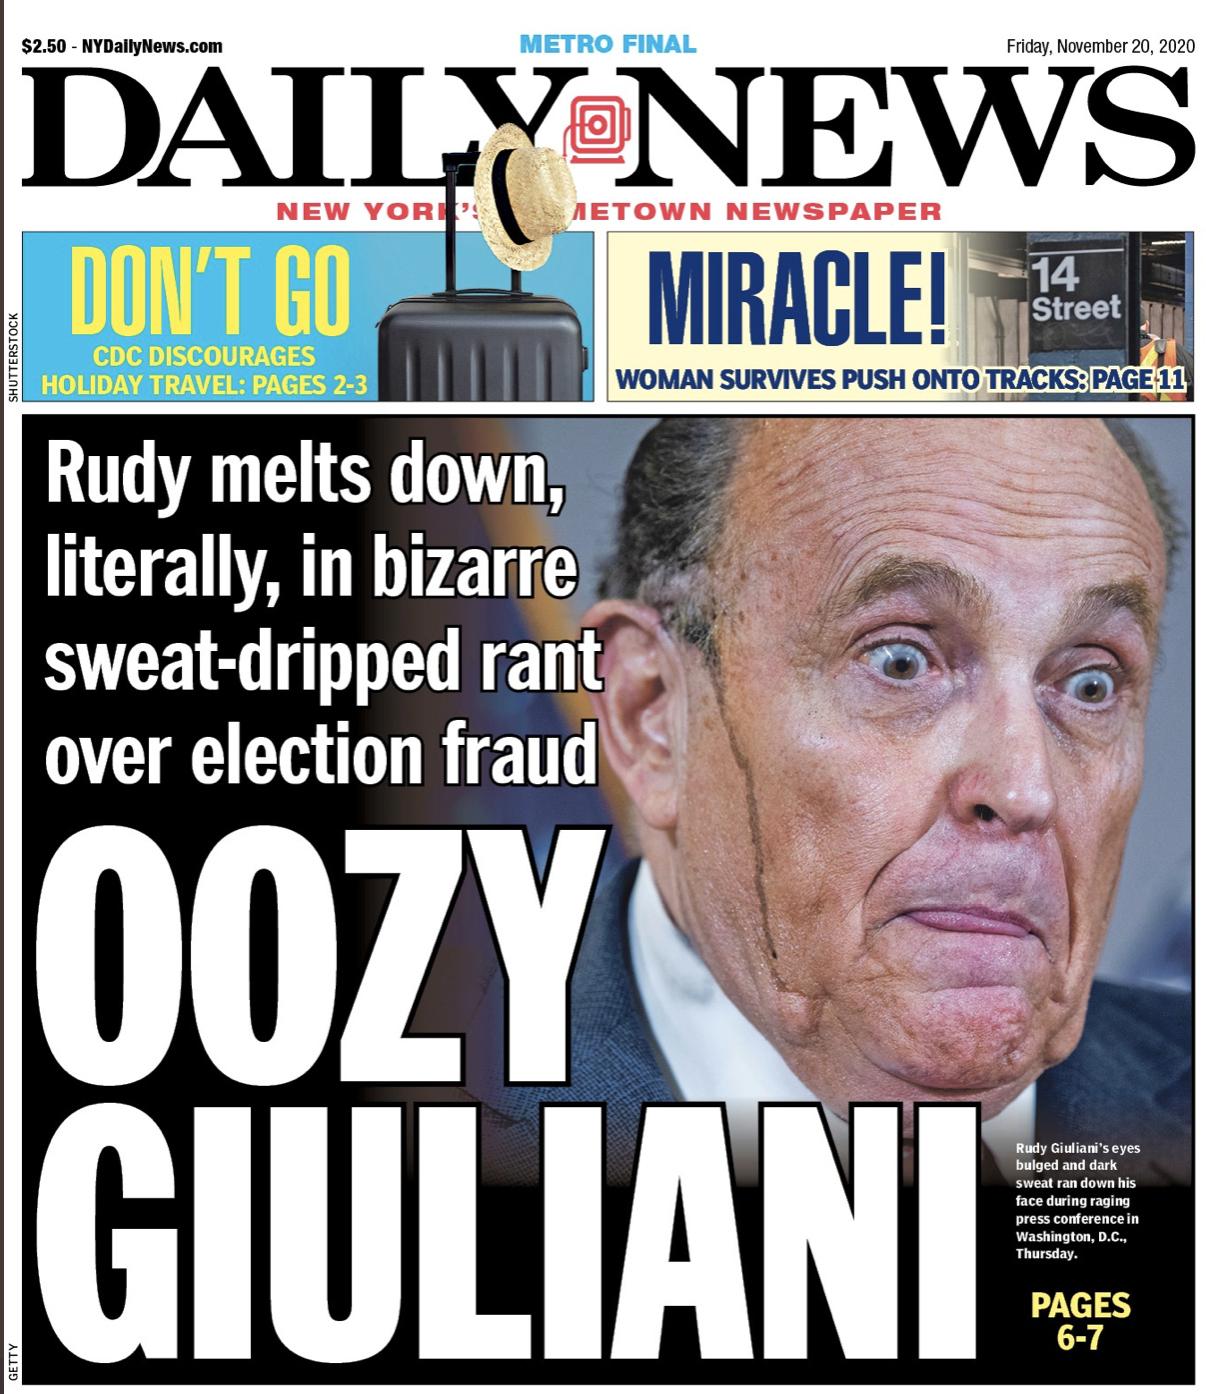 Mr. Astroglide® Lube - Oozy Giuliani